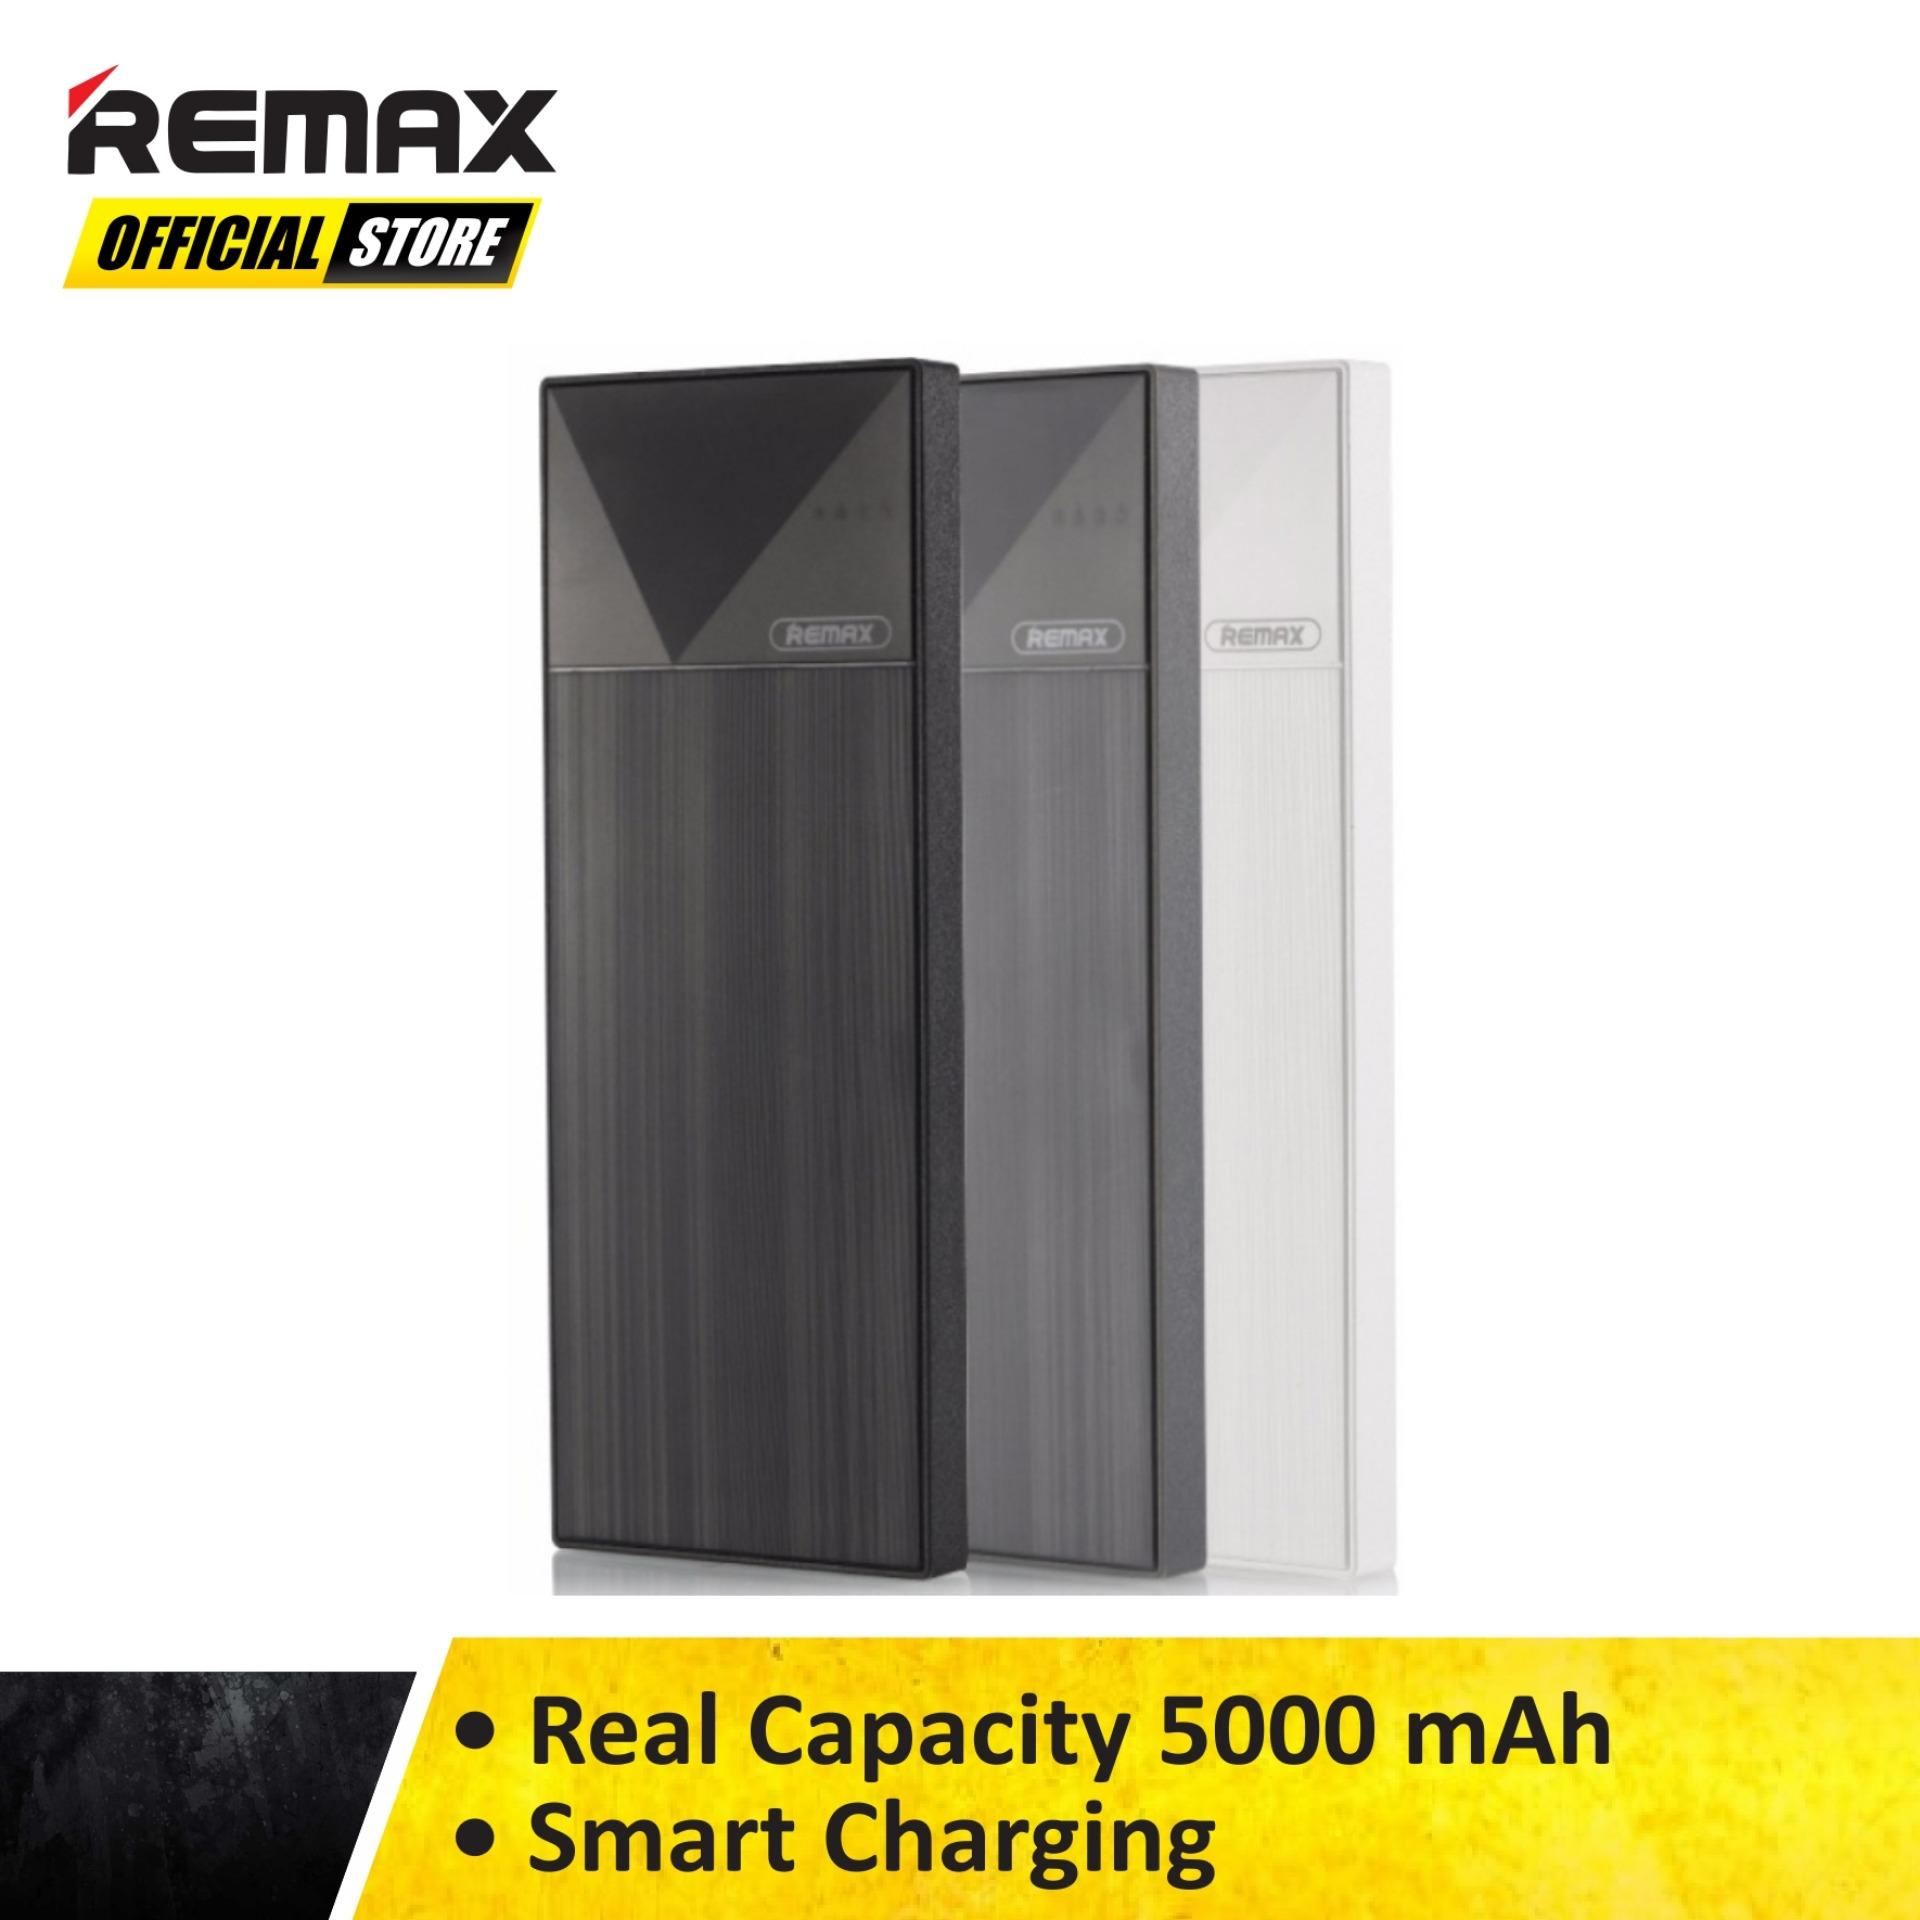 Remax Thoway Power Bank 5000 mAh RPP-54 Original Garansi / Powerbank Original / Powerbank Garansi / Powerbank Murah / Powerbank Bagus / Powerbank Awet